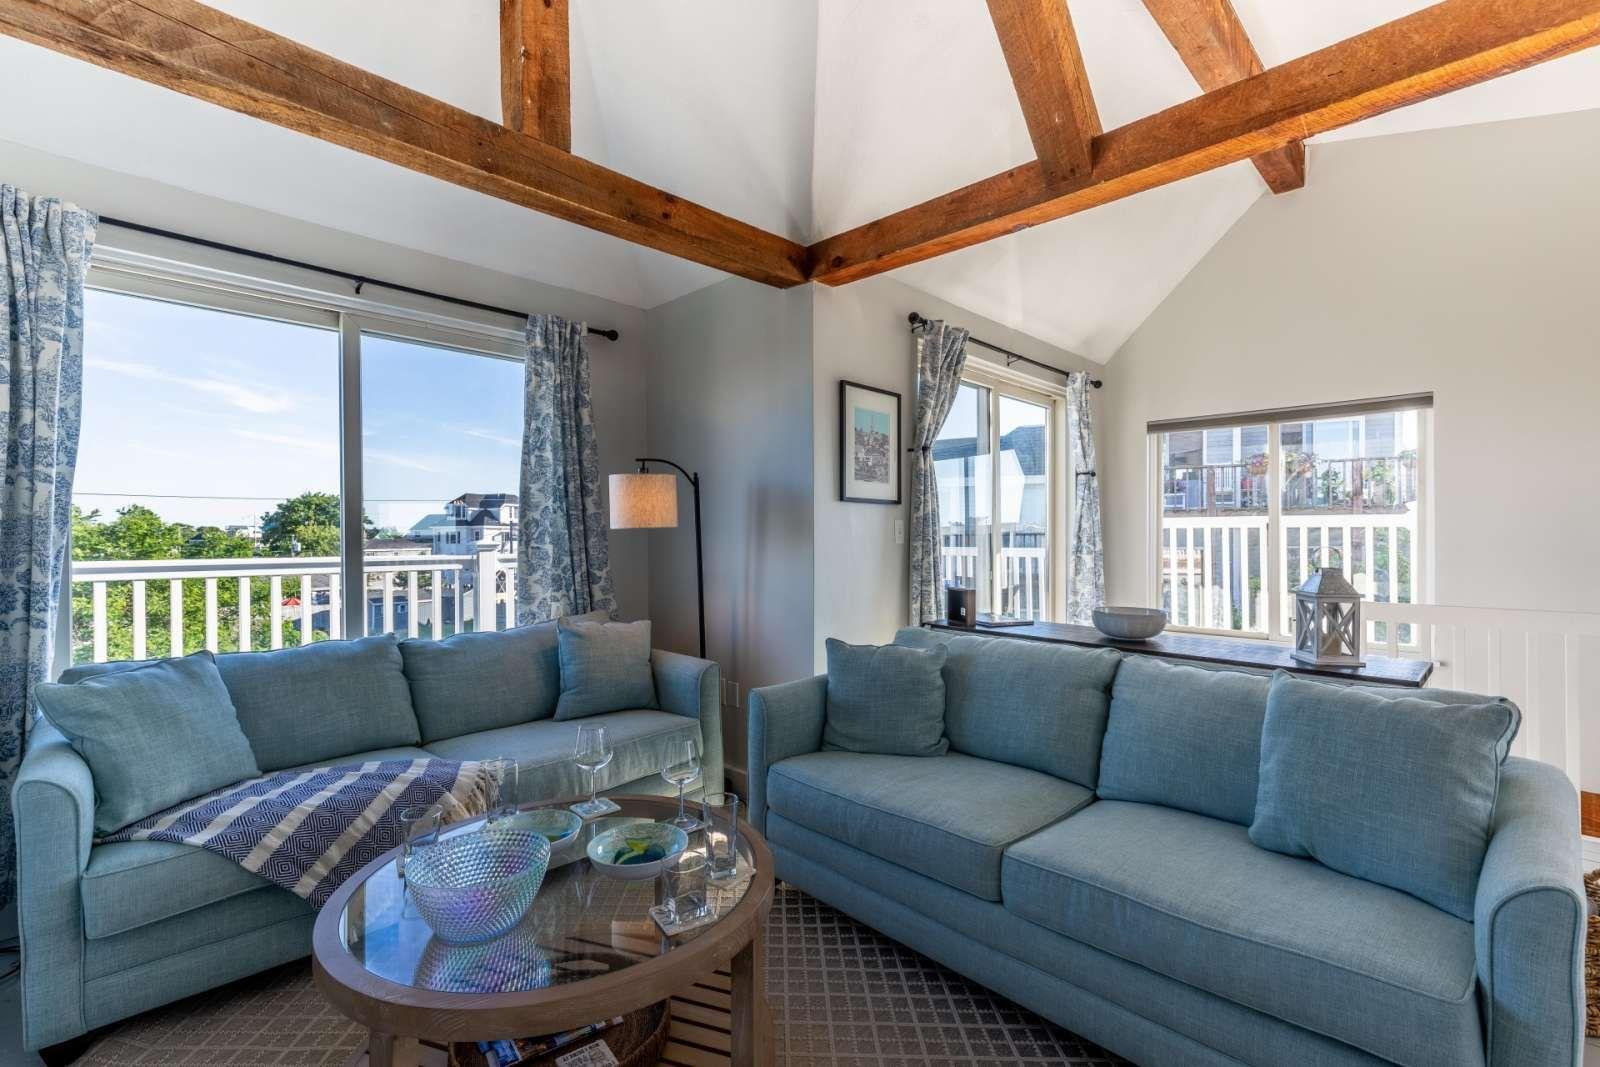 Newburyport Vacation Rental New 20 Steps To Beach Access Family Friendly Grill Peek A Boo Water Views Sea Lo Beach House Condos Condo Rental House Rental